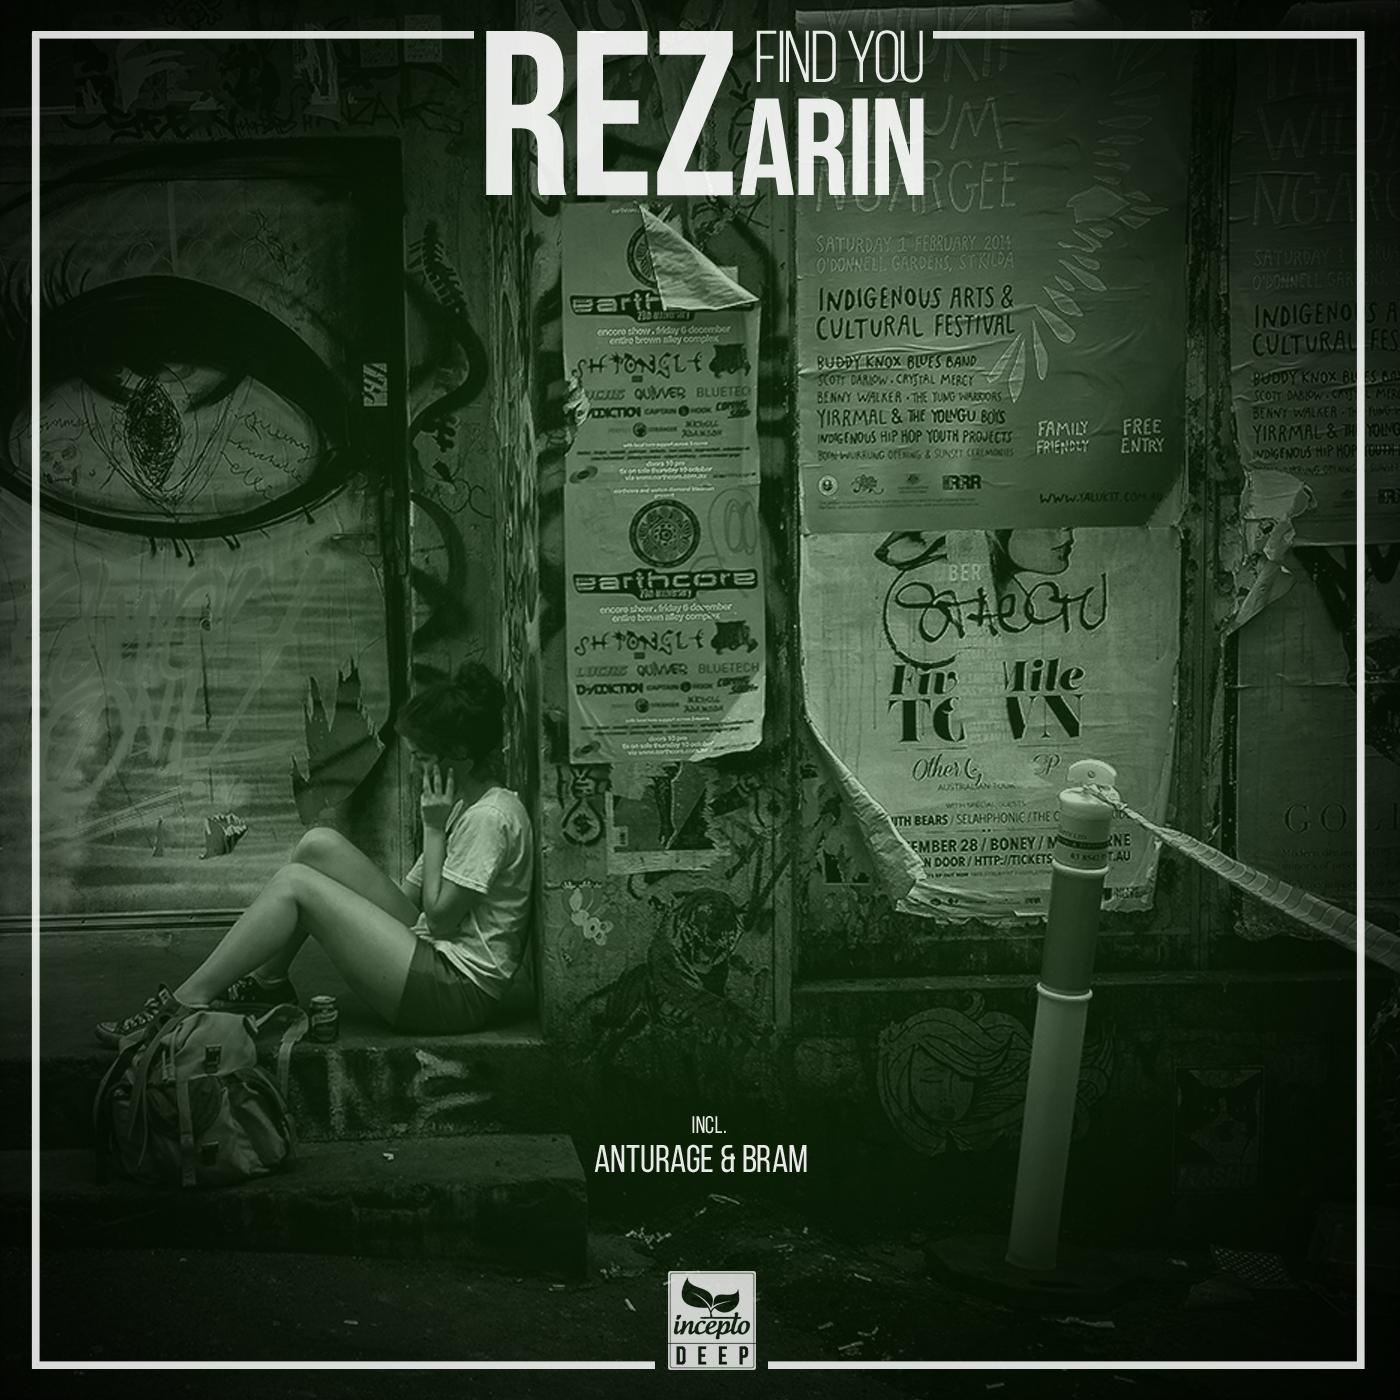 REZarin - Find You (Bram Remix)